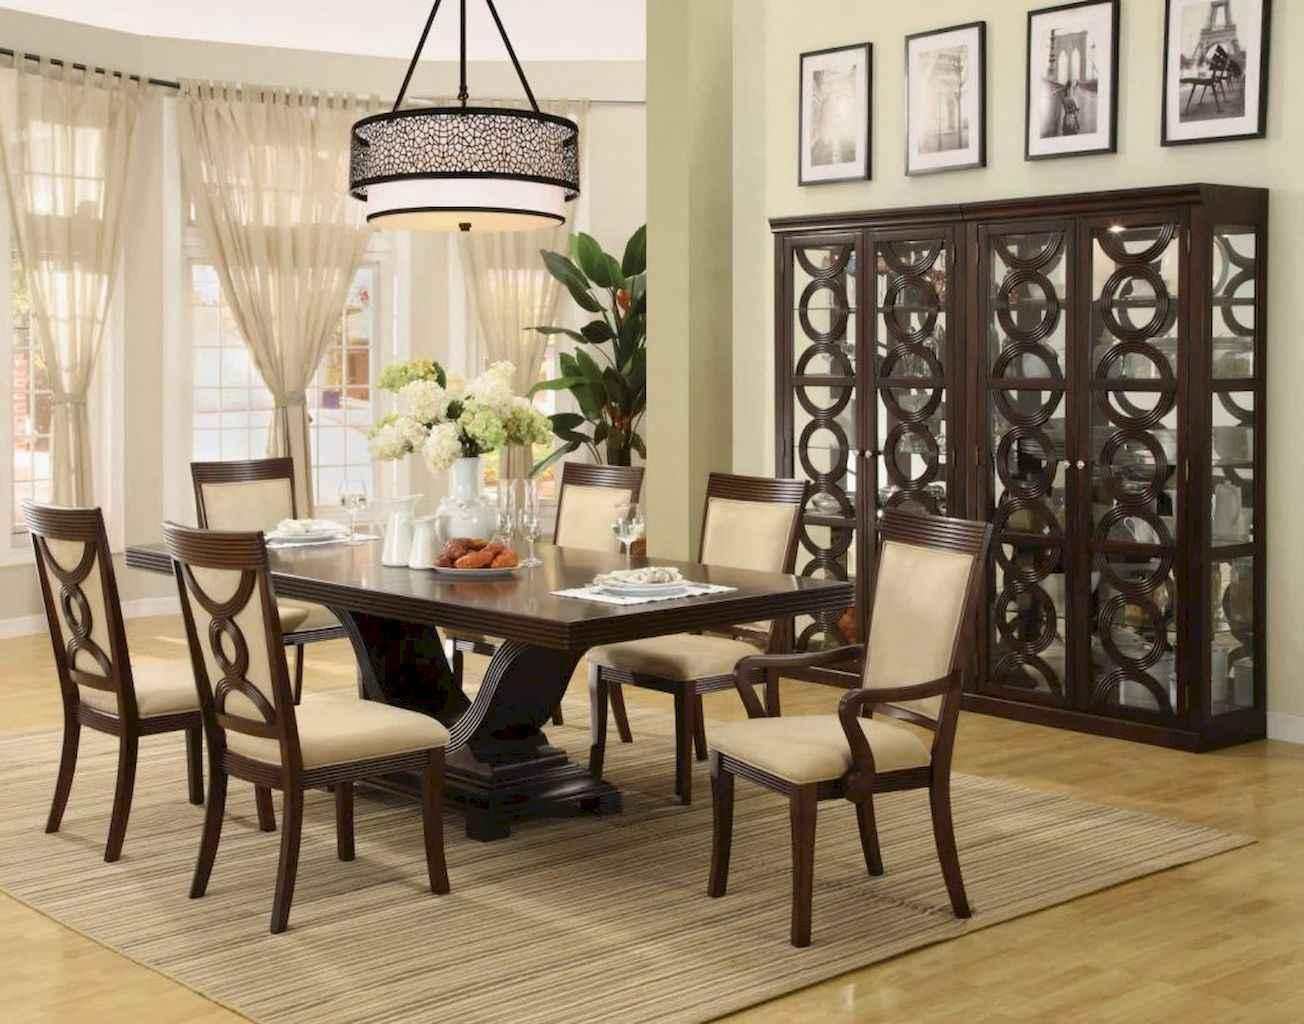 100 Rustic Farmhouse Dining Room Decor Ideas (40)